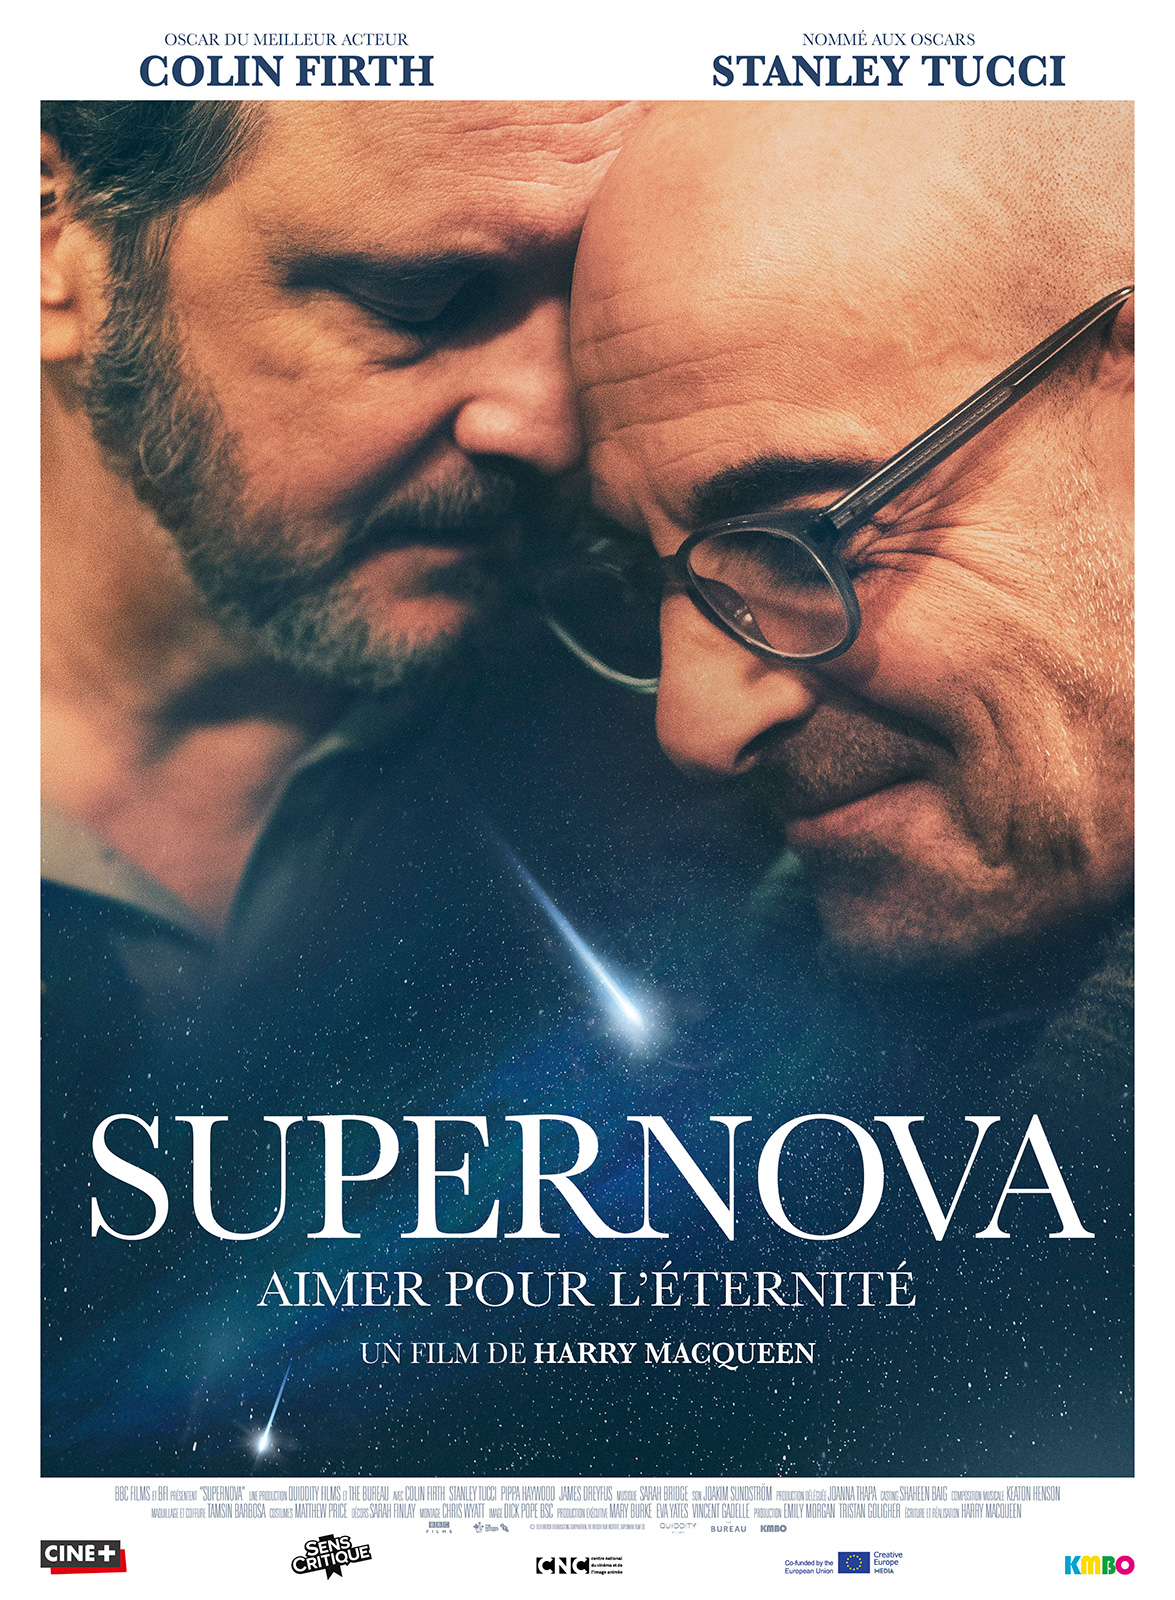 Supernova - film 2020 - AlloCiné